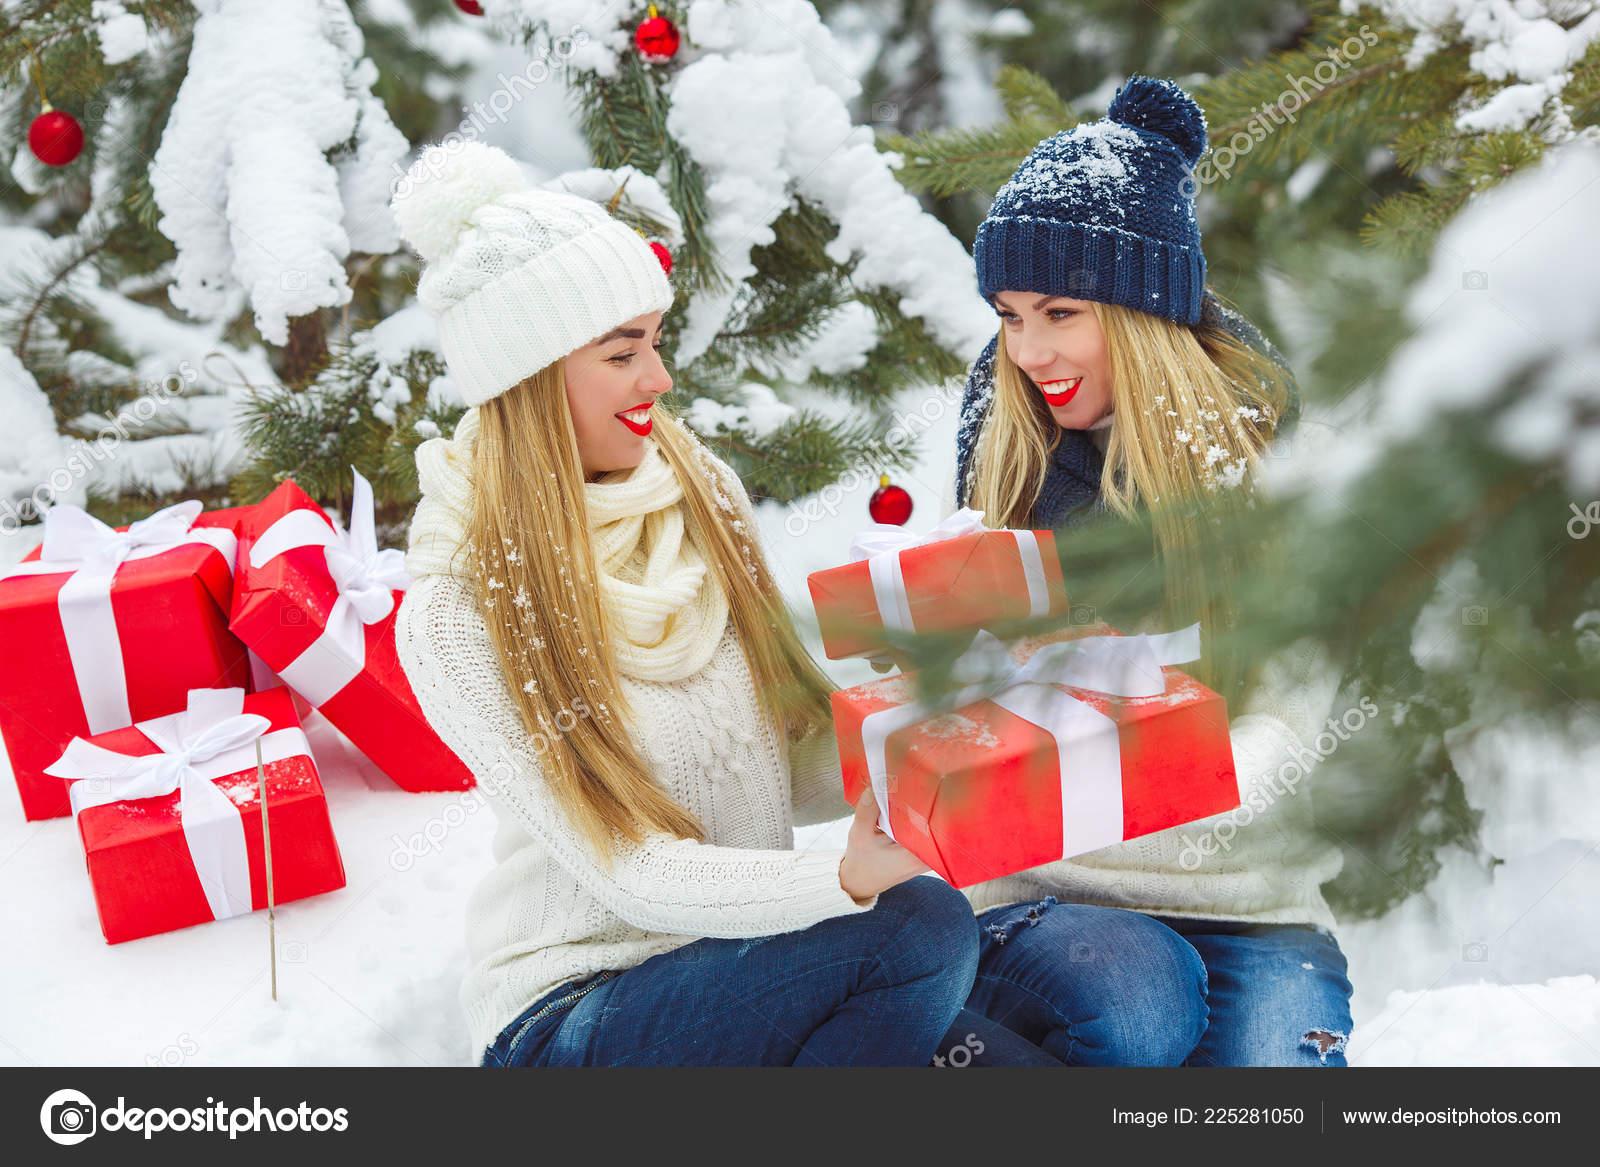 Ladies Christmas Gifts.Girlfriends Having Fun Christmas Presents Outdoors Women